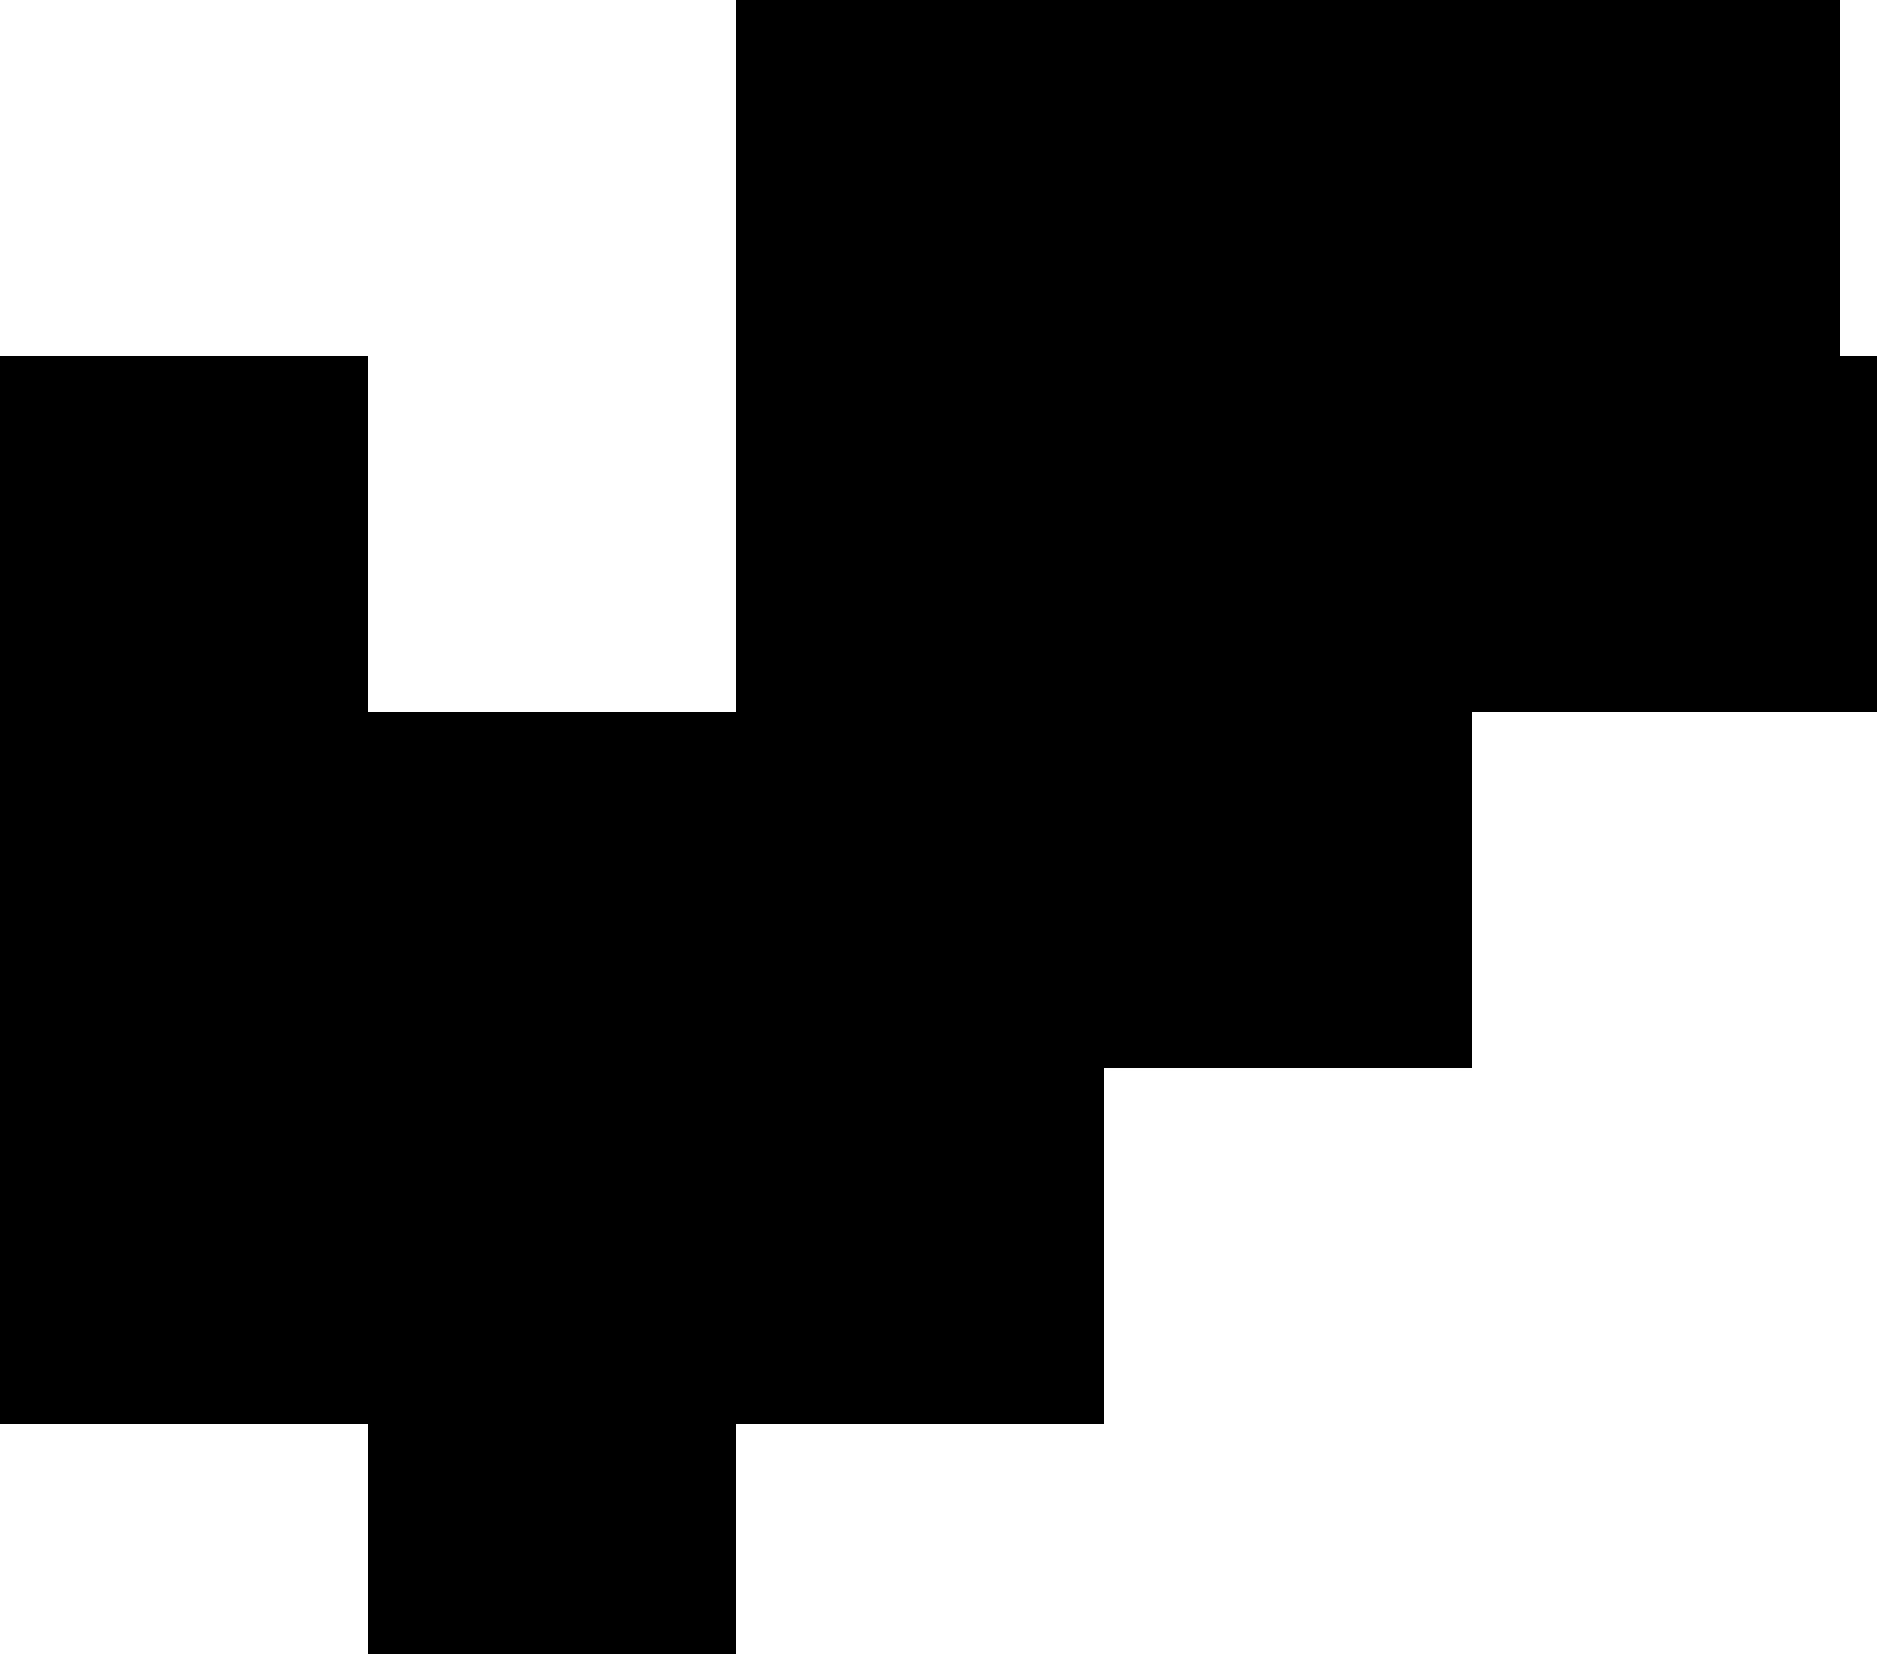 Кладрибин (cladribine).